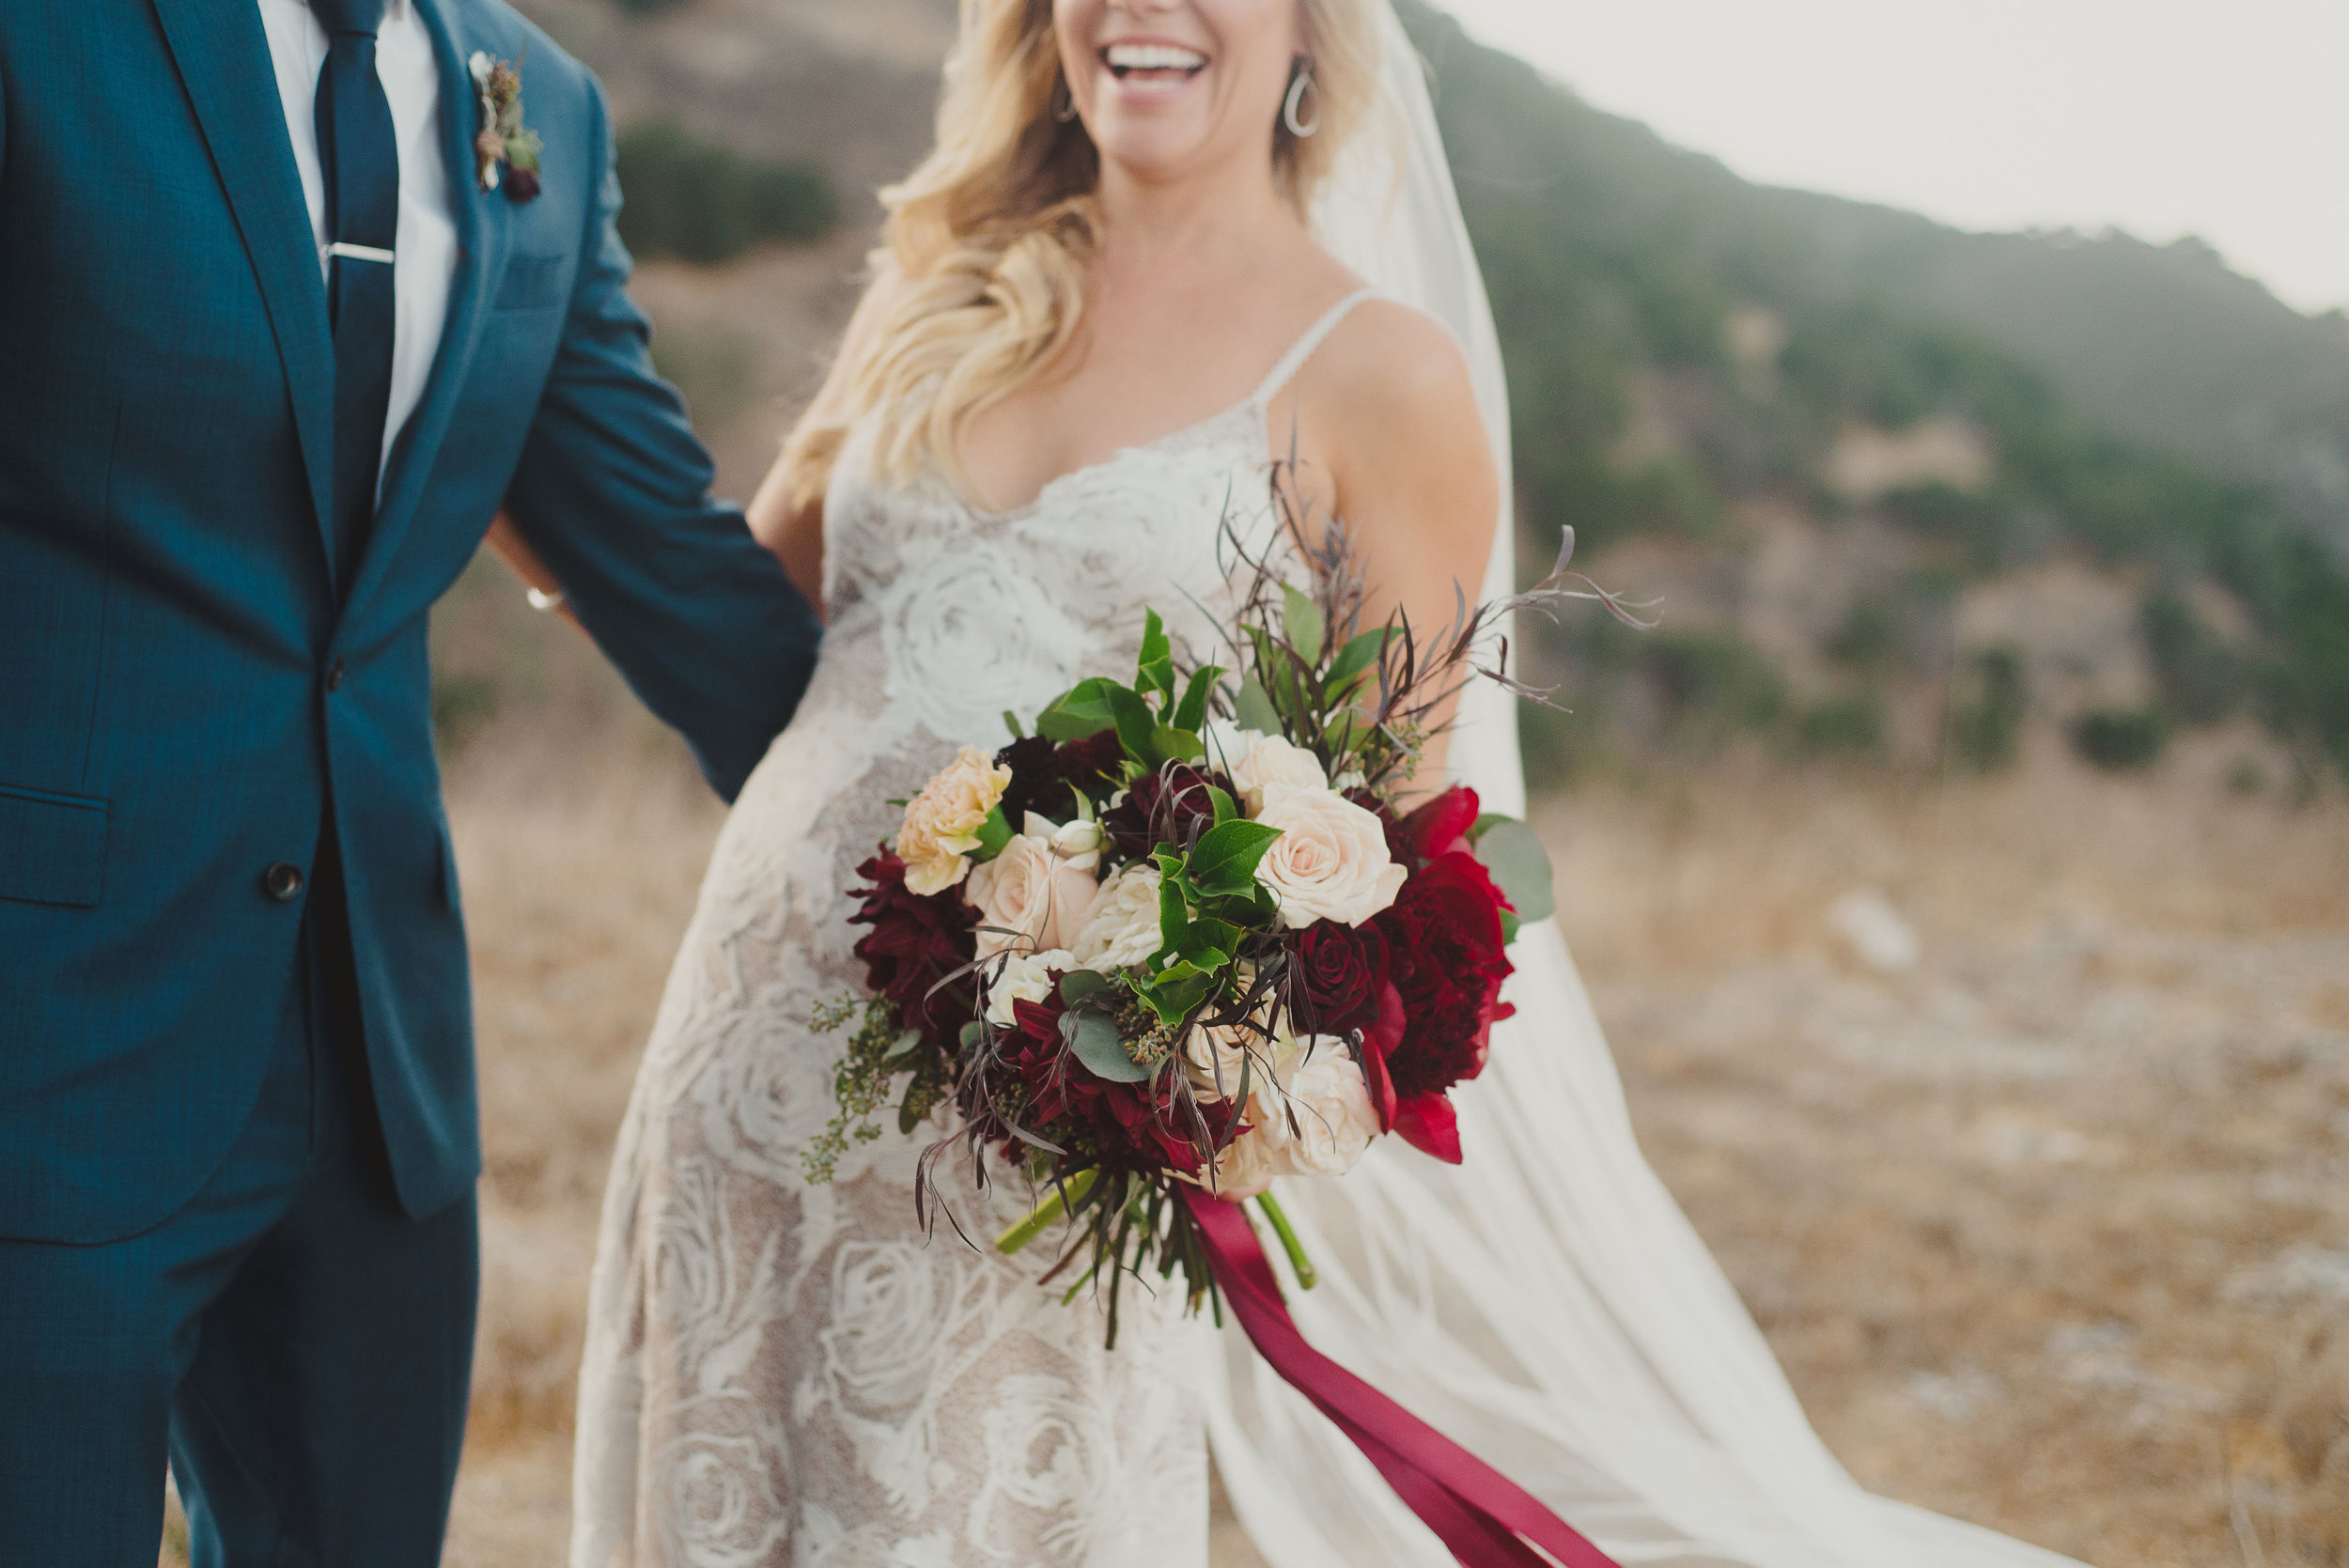 181026-Marisa-JB-Wedding-5049.jpg